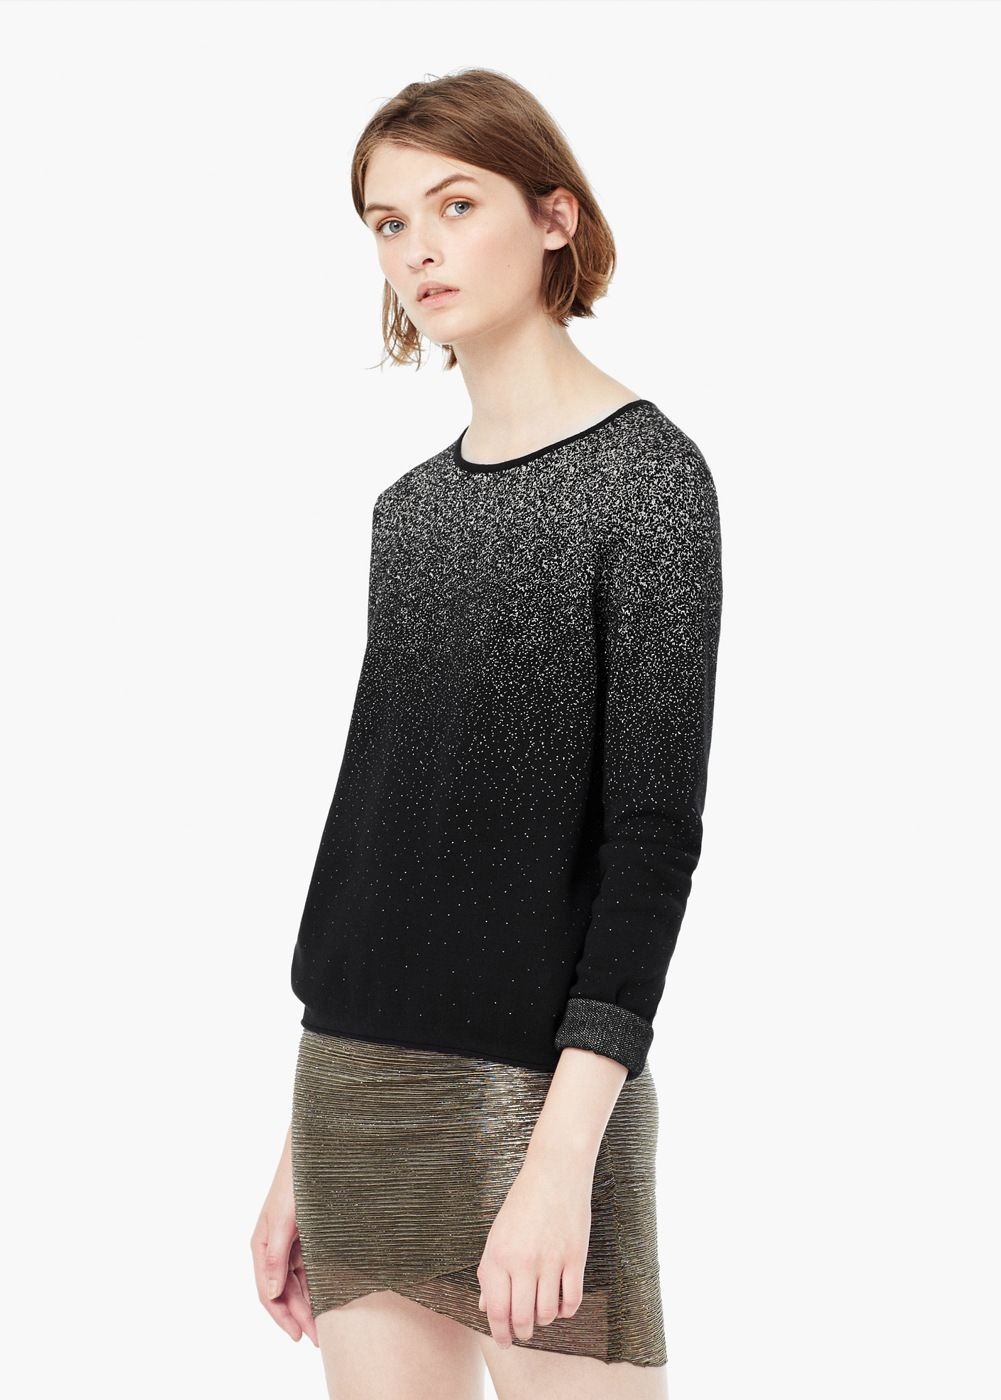 Jersey degradado algodón - Cárdigans y jerséis de Mujer  a535f74877ec